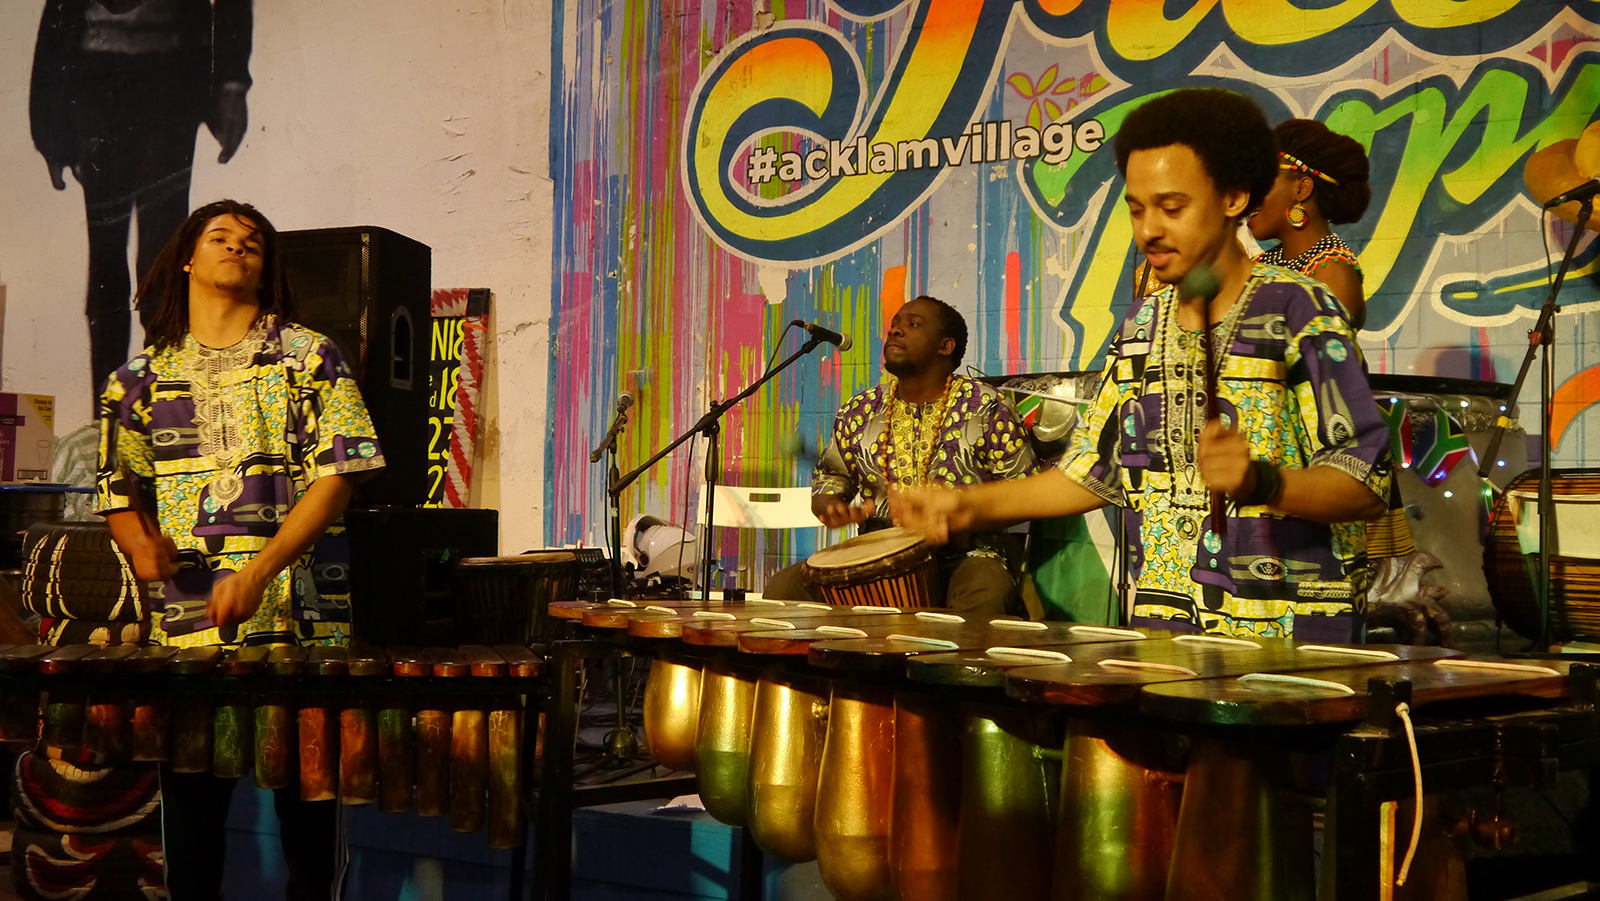 Otto_Gumaelius_African_Marimba_Entertainment_And_Lessons_London